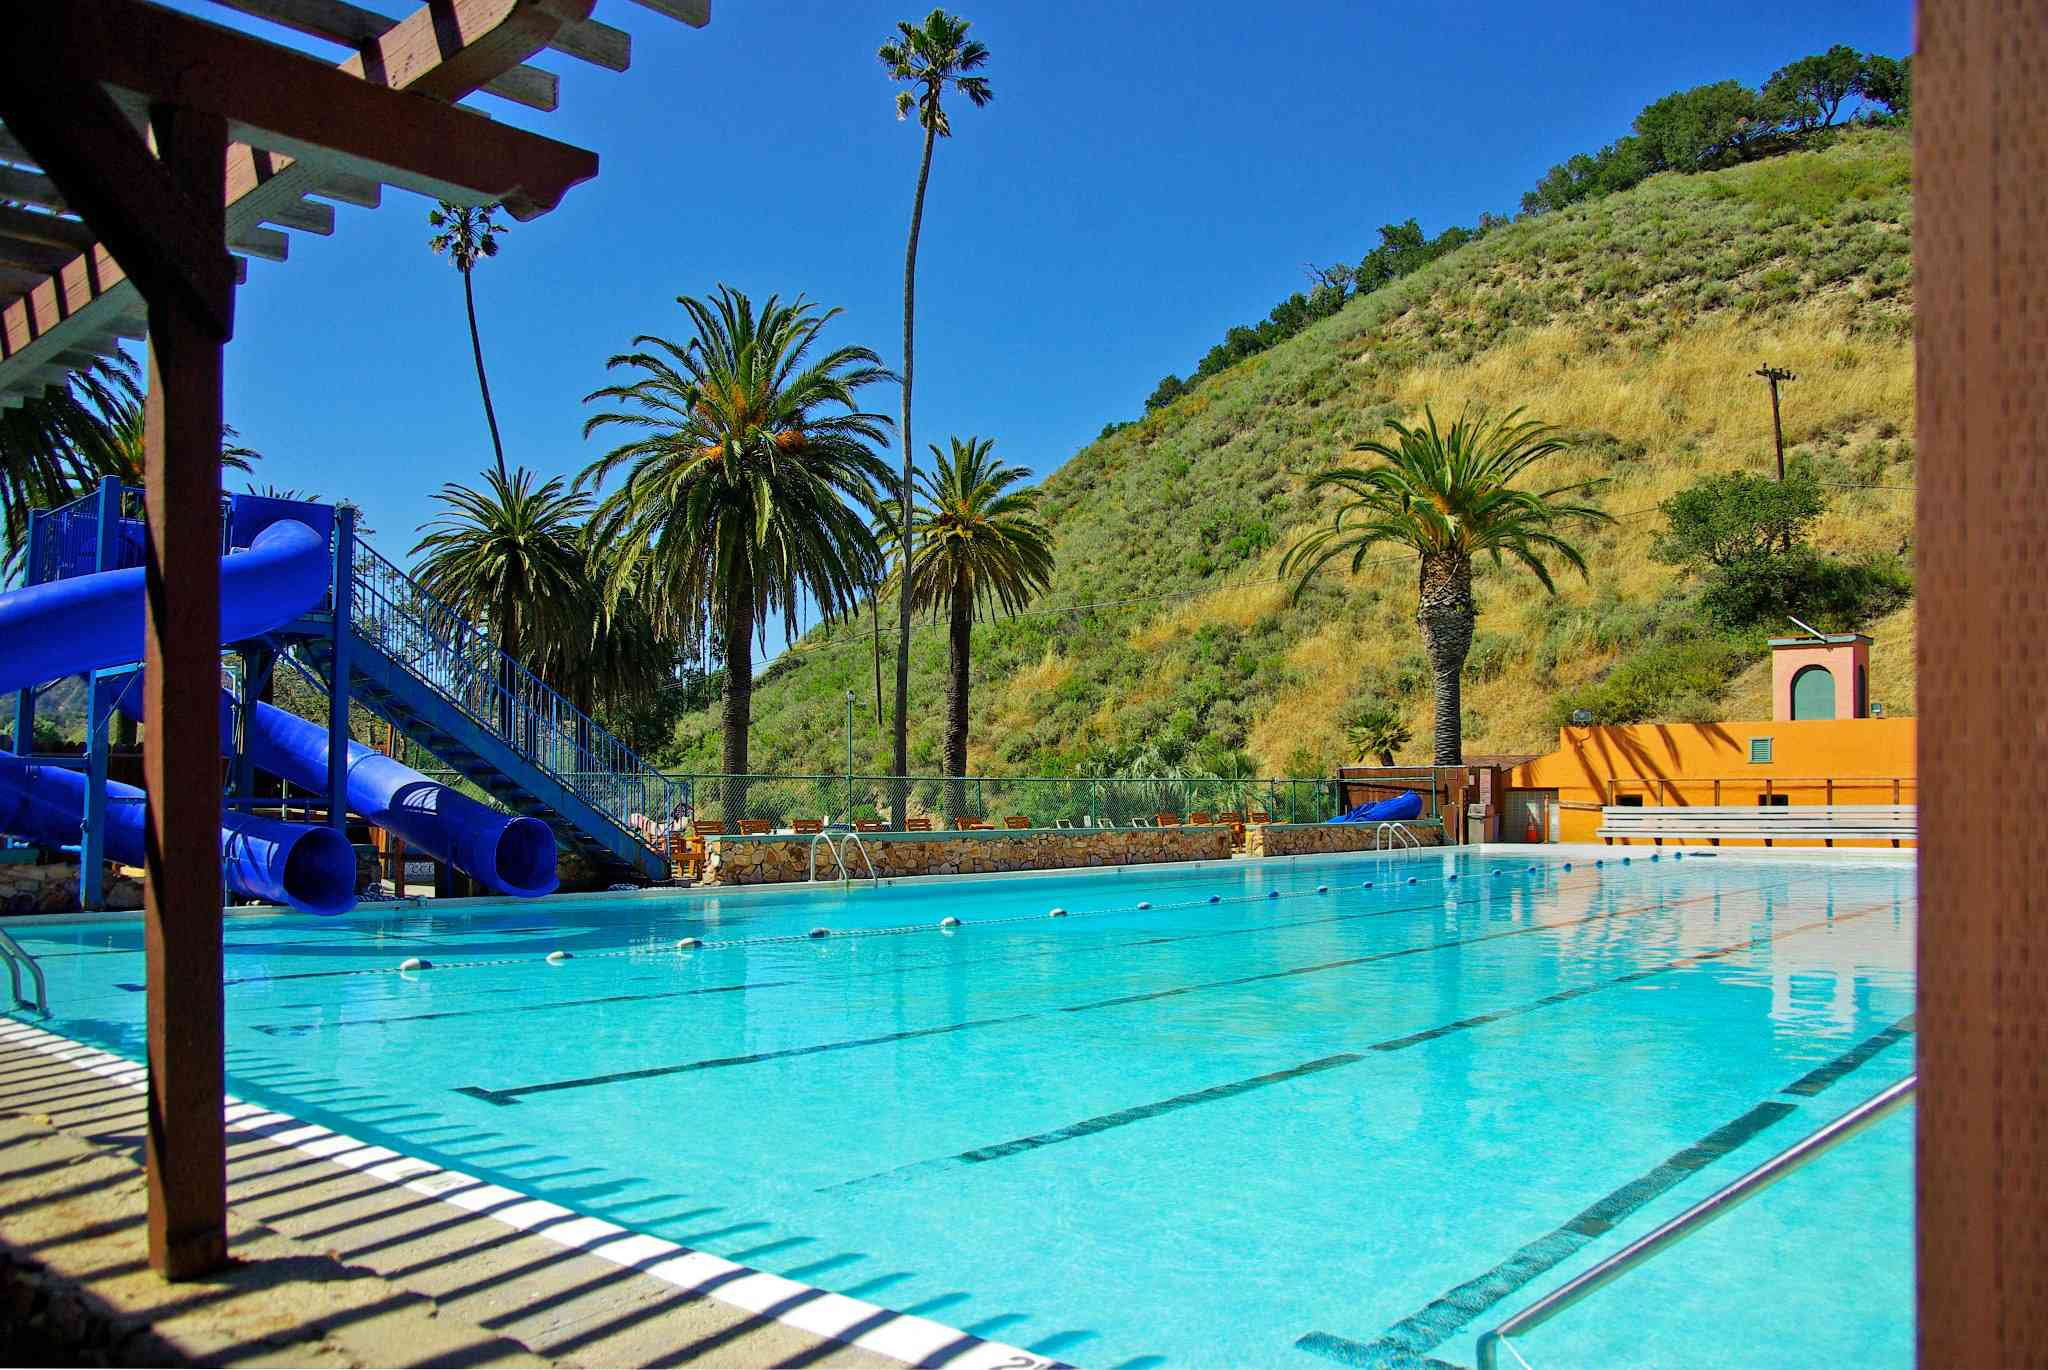 The Pool at Avila Hot Springs